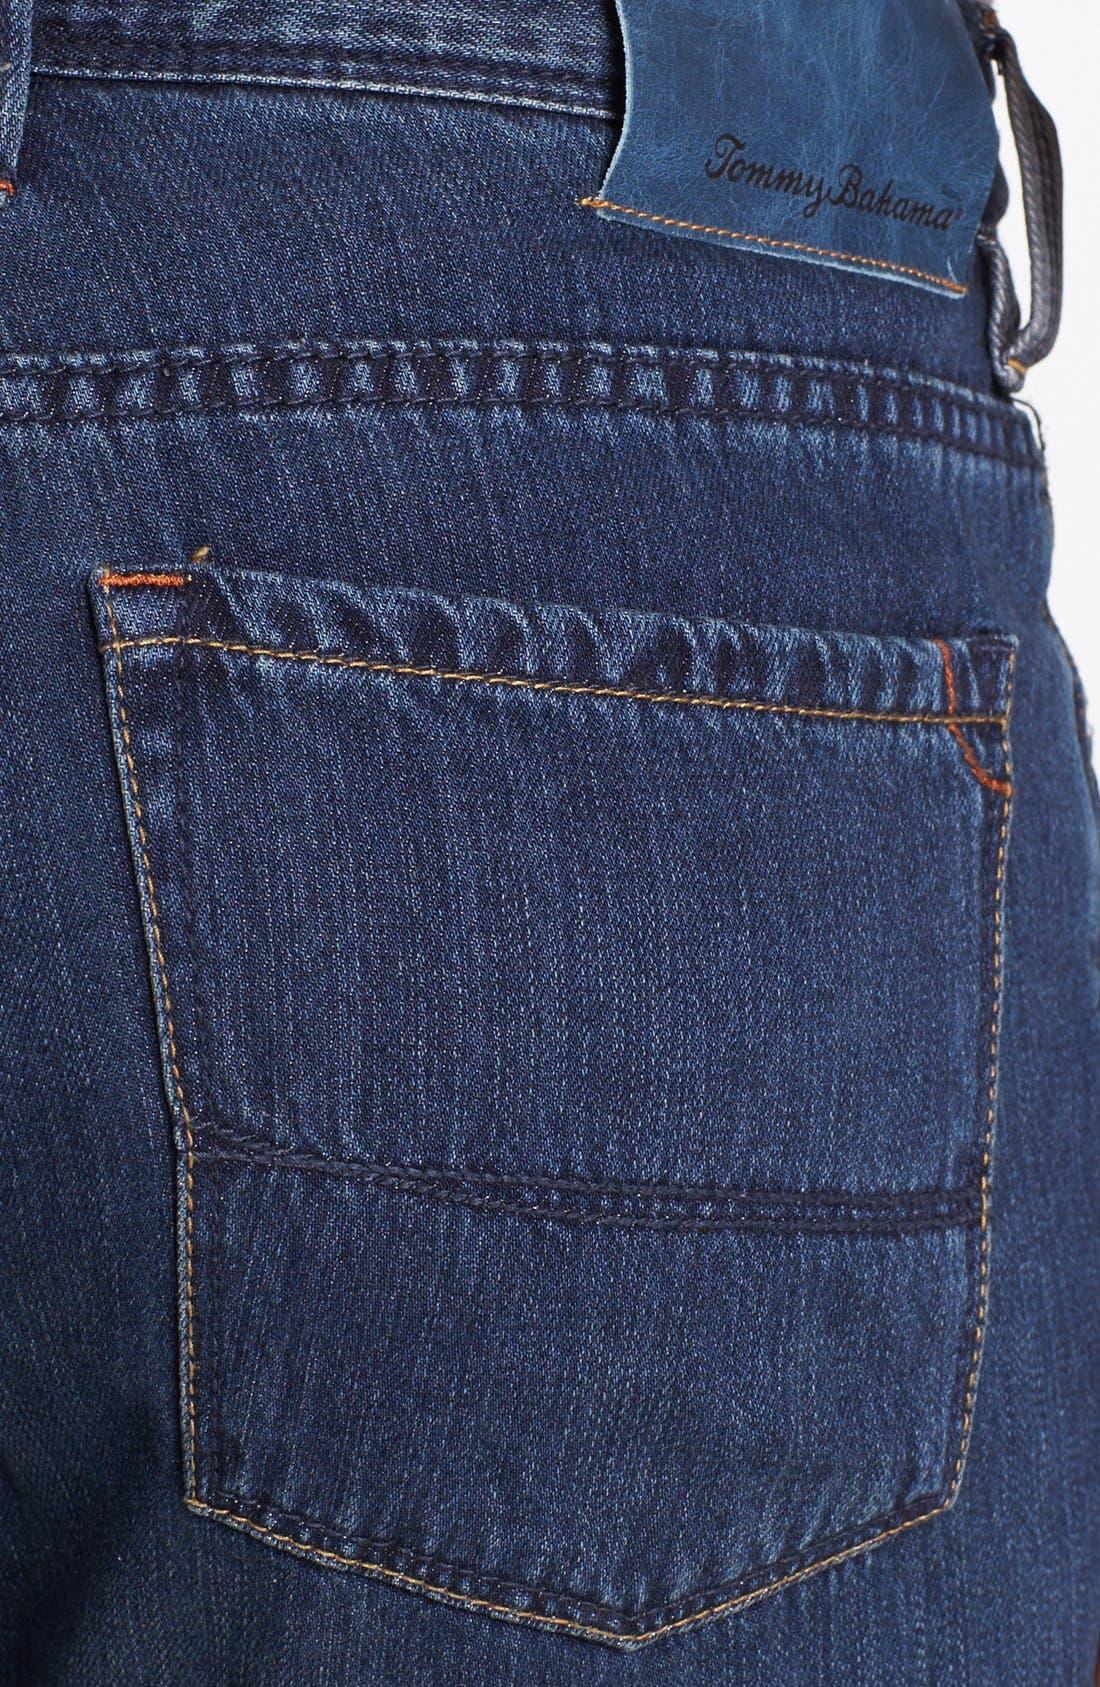 Alternate Image 4  - Tommy Bahama Denim 'Coastal Island' Standard Fit Jeans (Dark Storm)